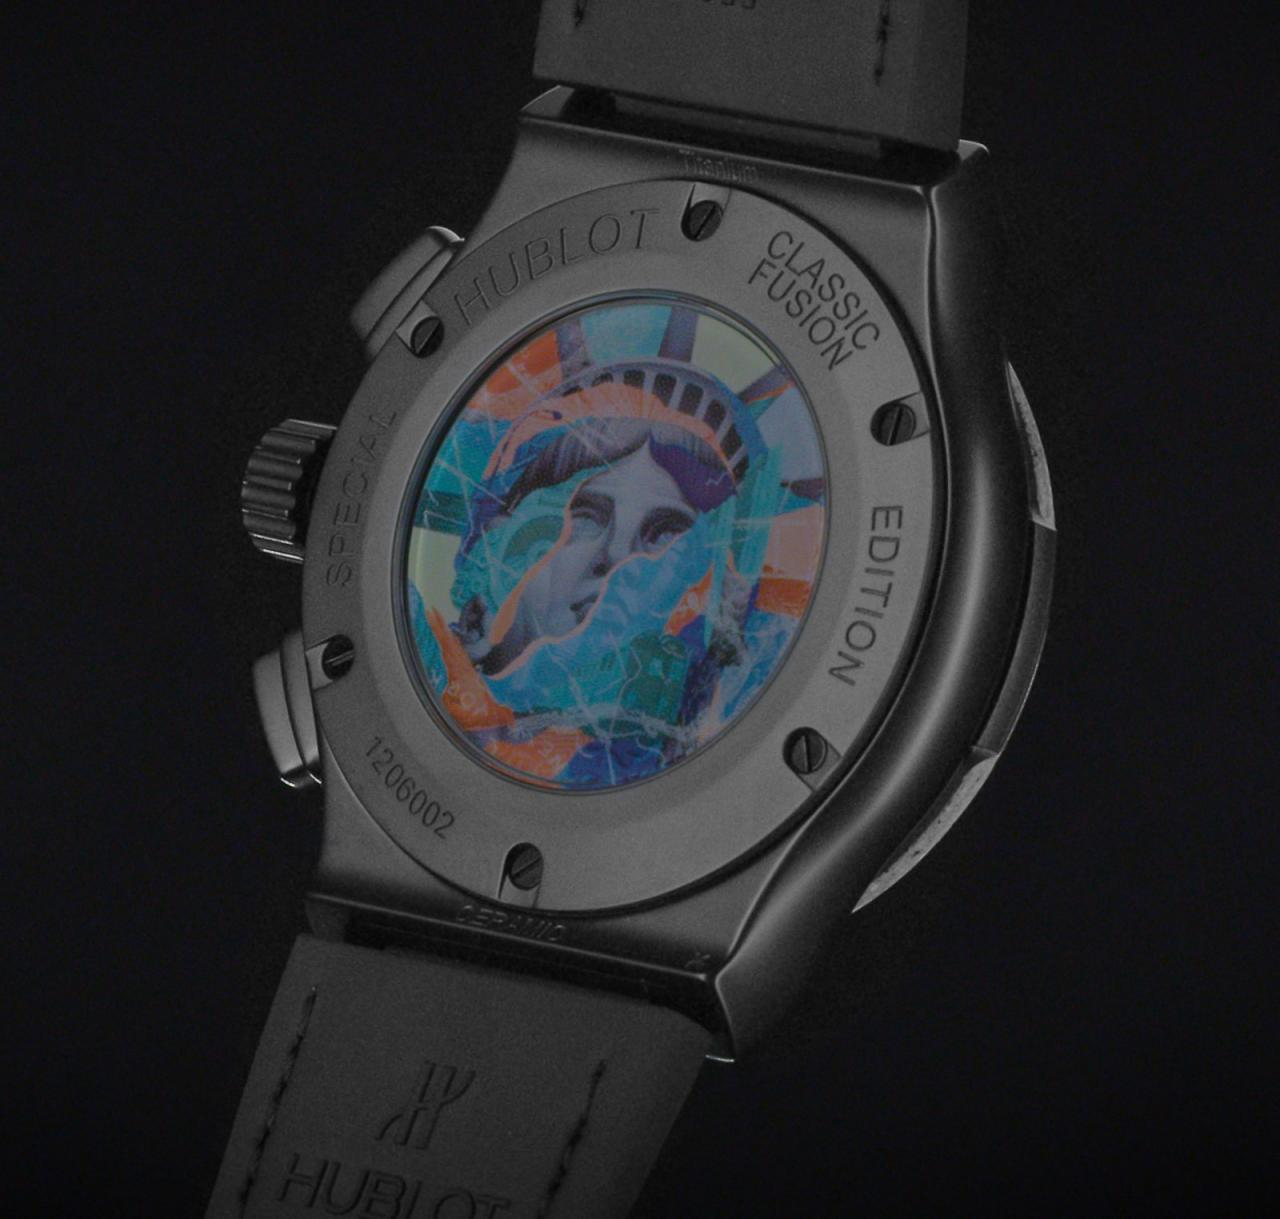 Hublot Classic Fusion Aerofusion Chronograph Concrete Jungle 4